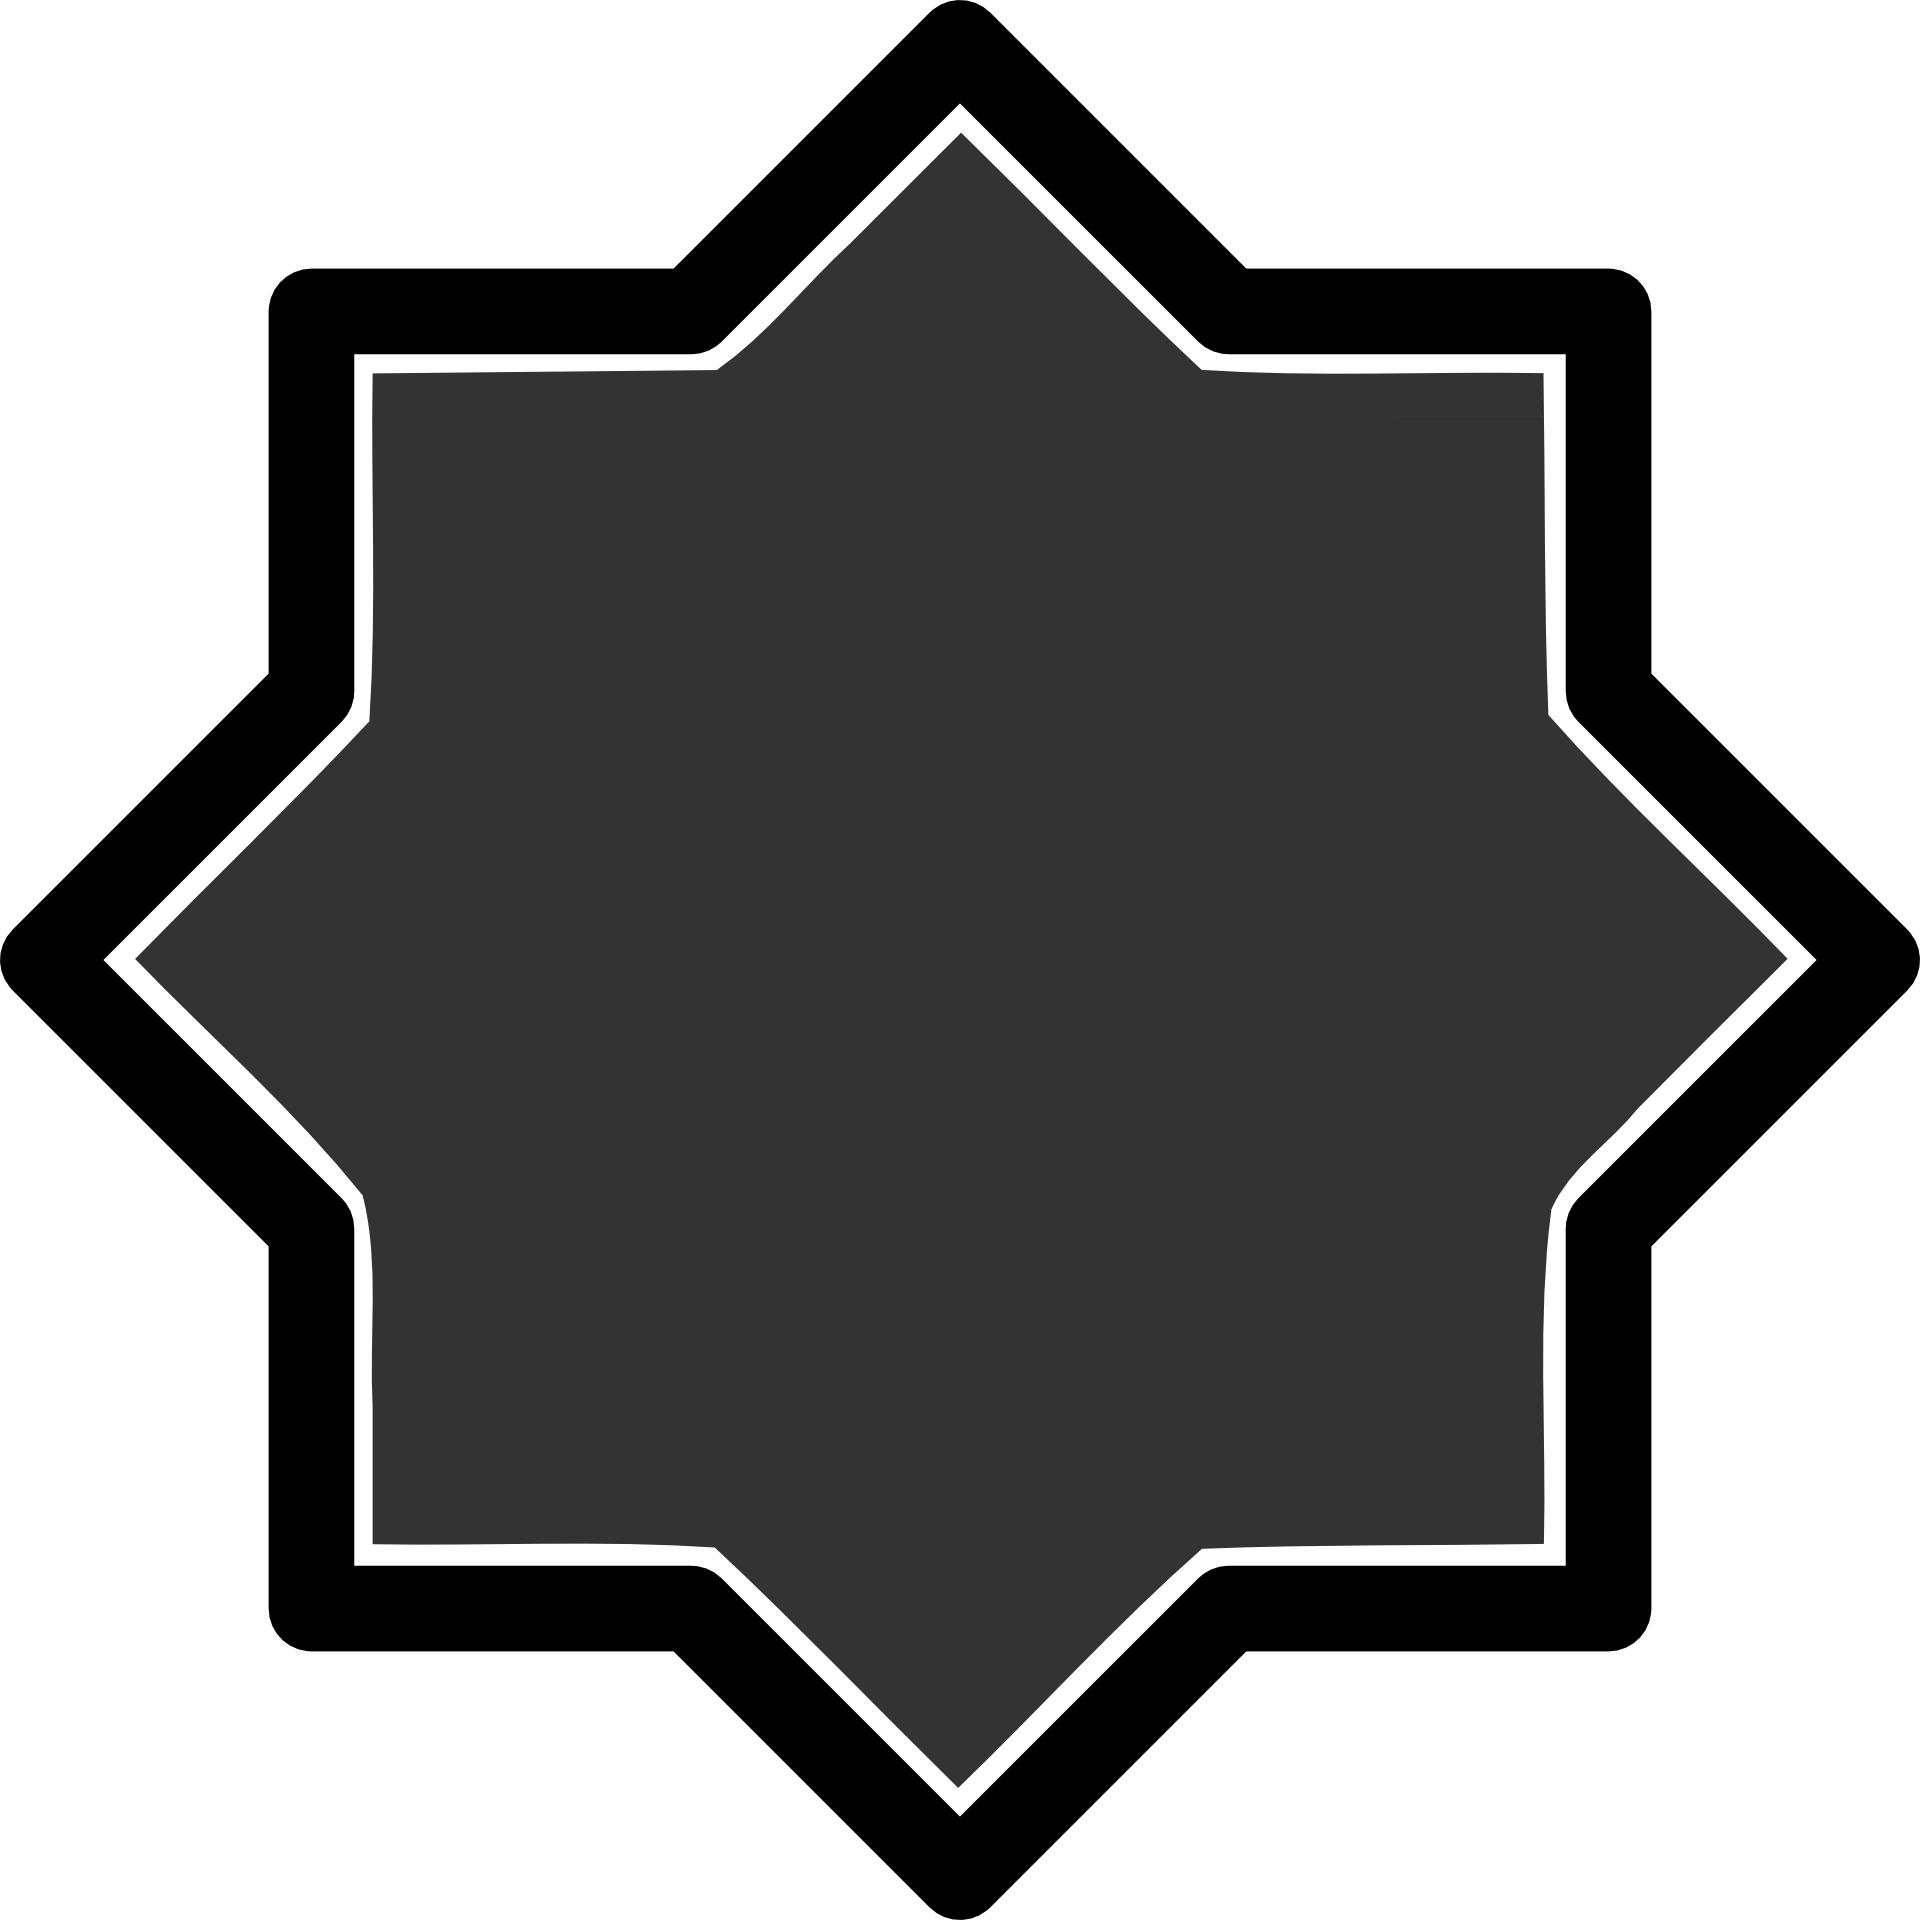 Islamic geometric patterns symbols. Geometry clipart line angle